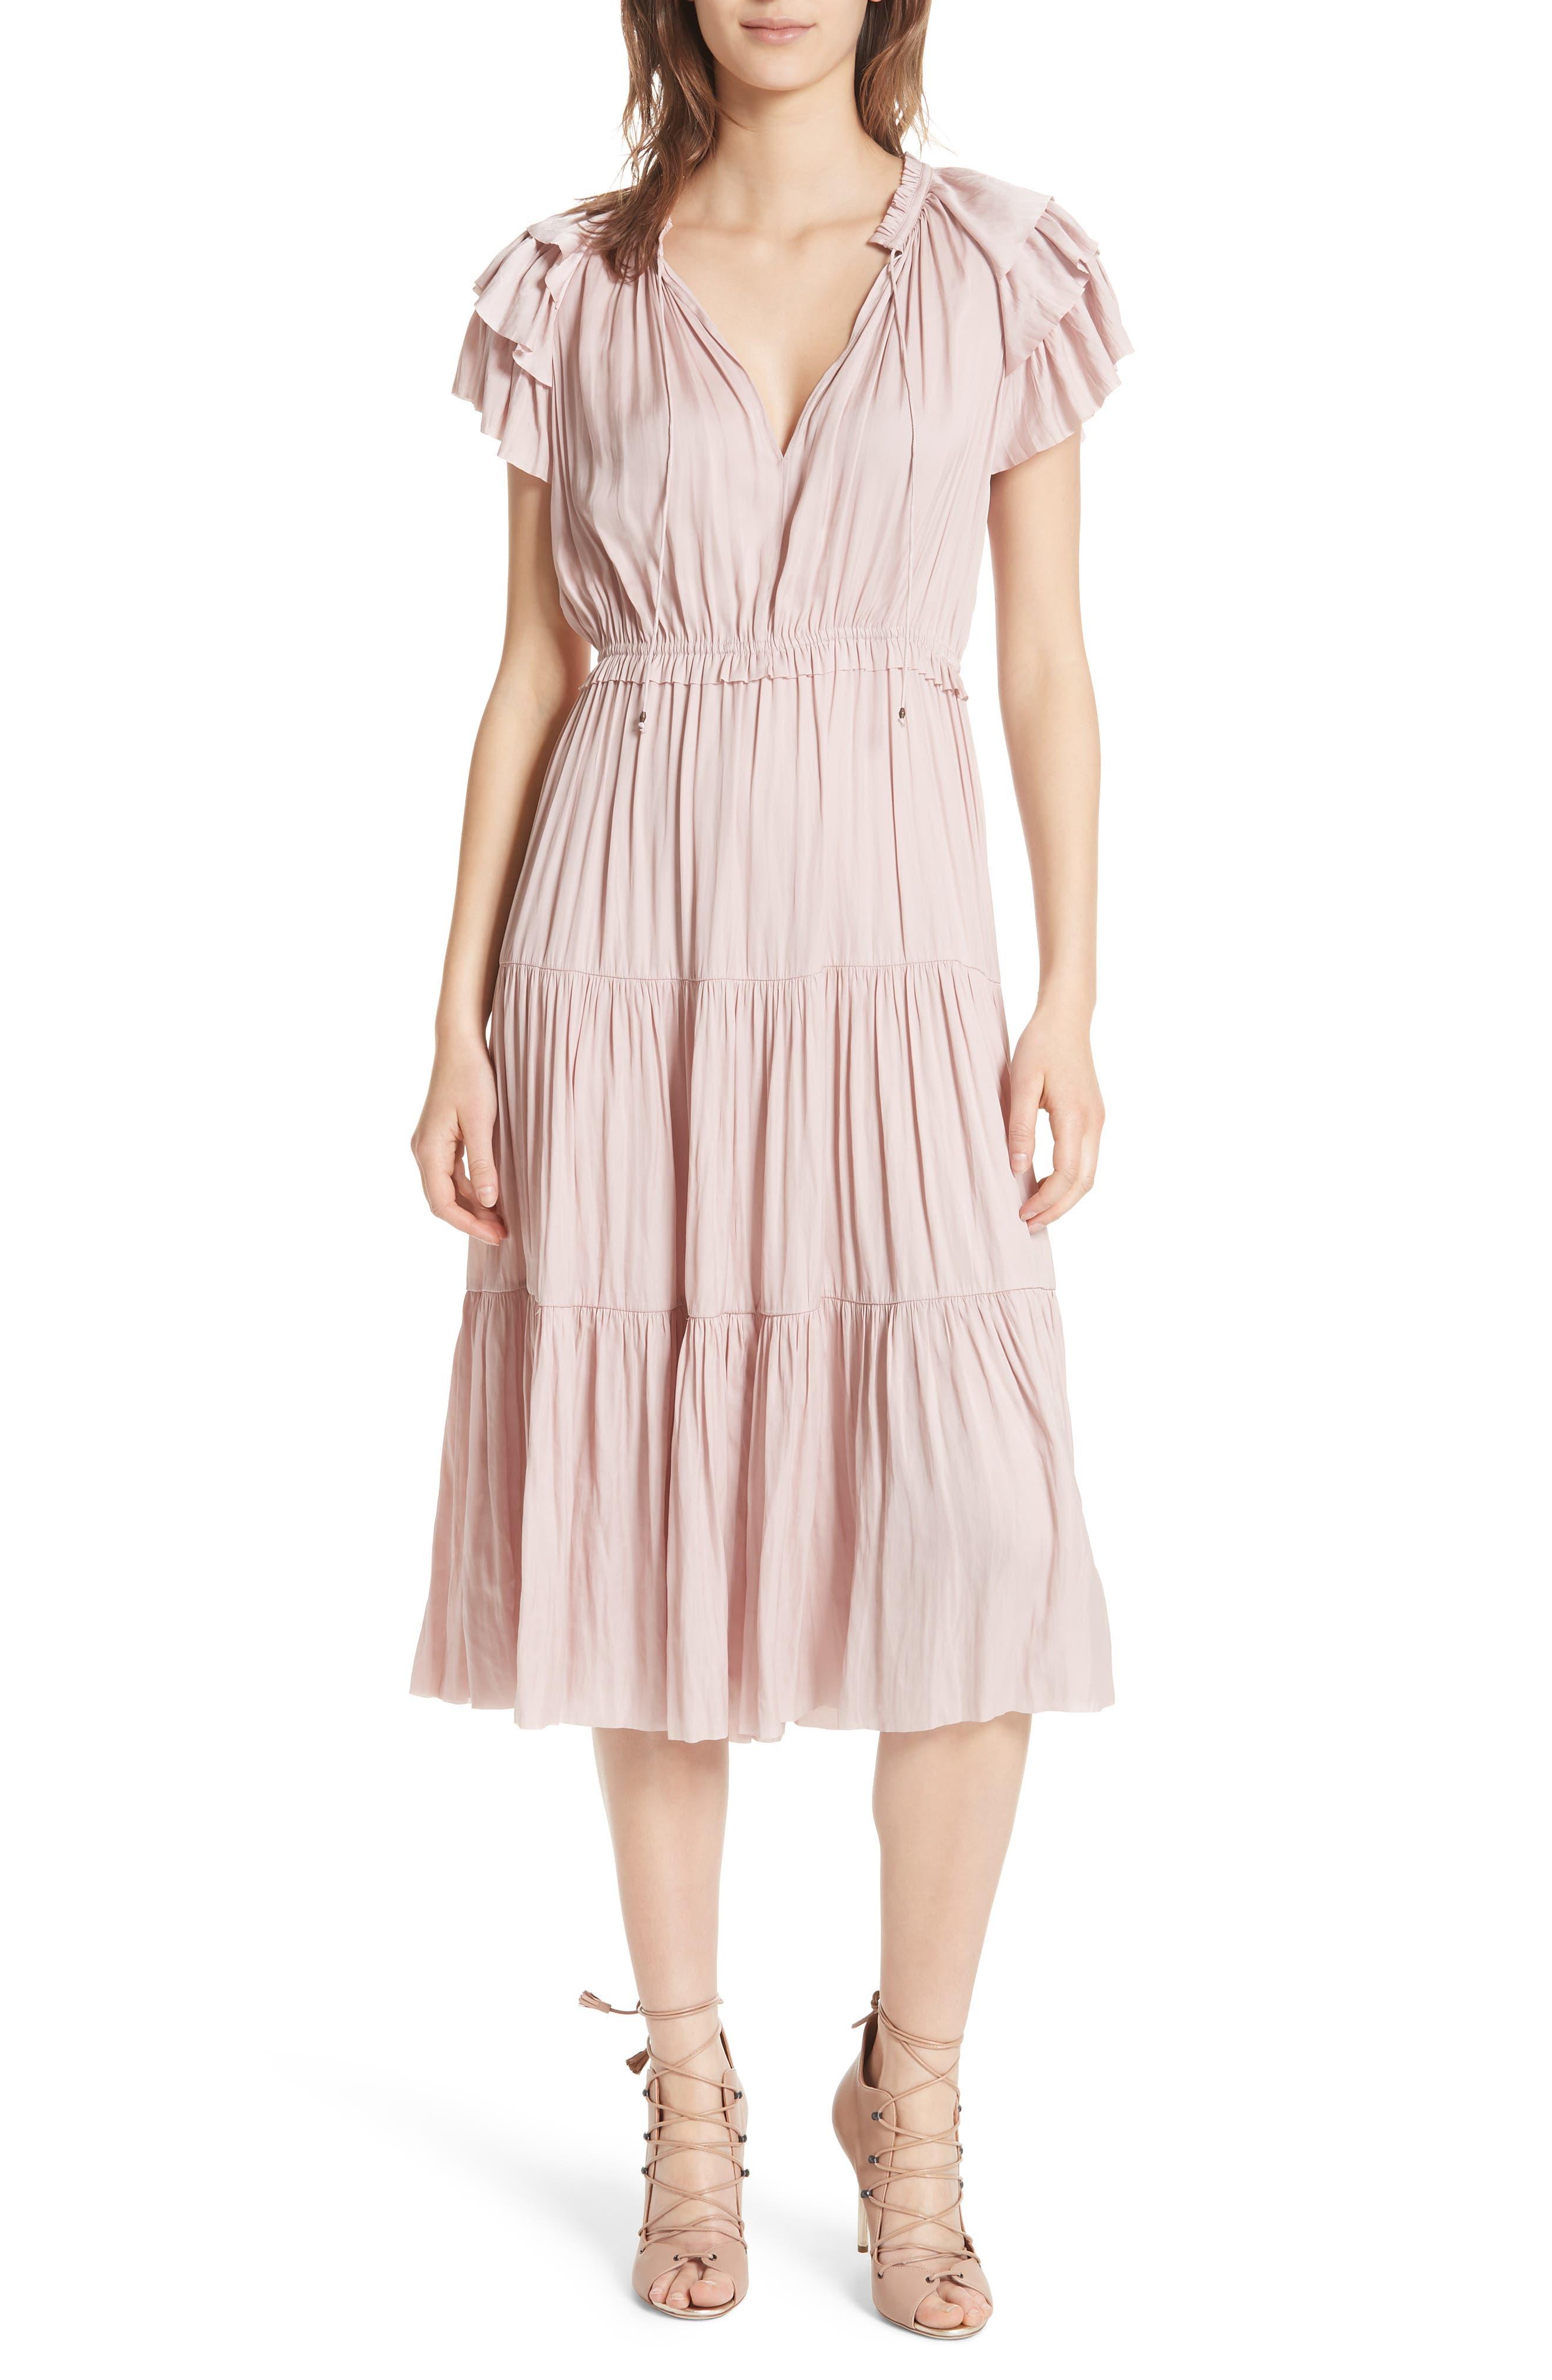 Blaire Satin Dress,                             Main thumbnail 1, color,                             Rose